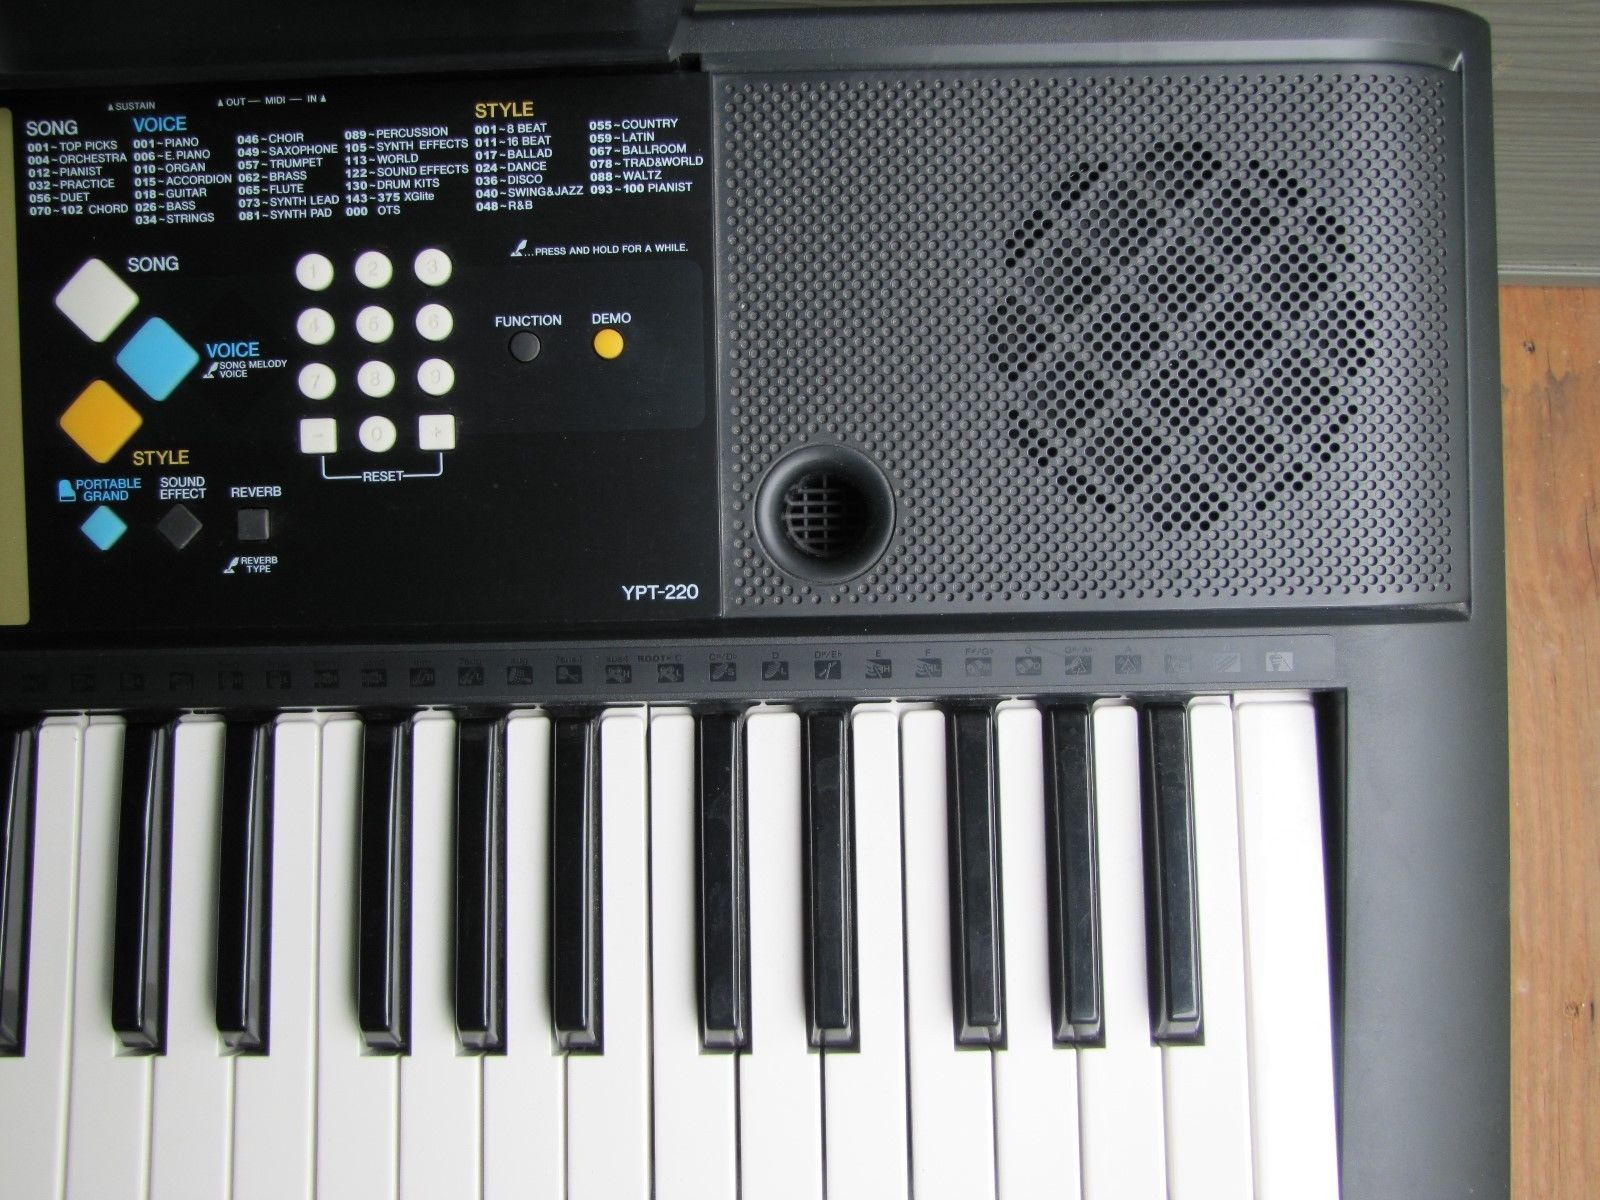 yamaha electronic keyboard model ypt 220 iob and 50 similar items rh bonanza com Toyota Manual Book Owner's Manual